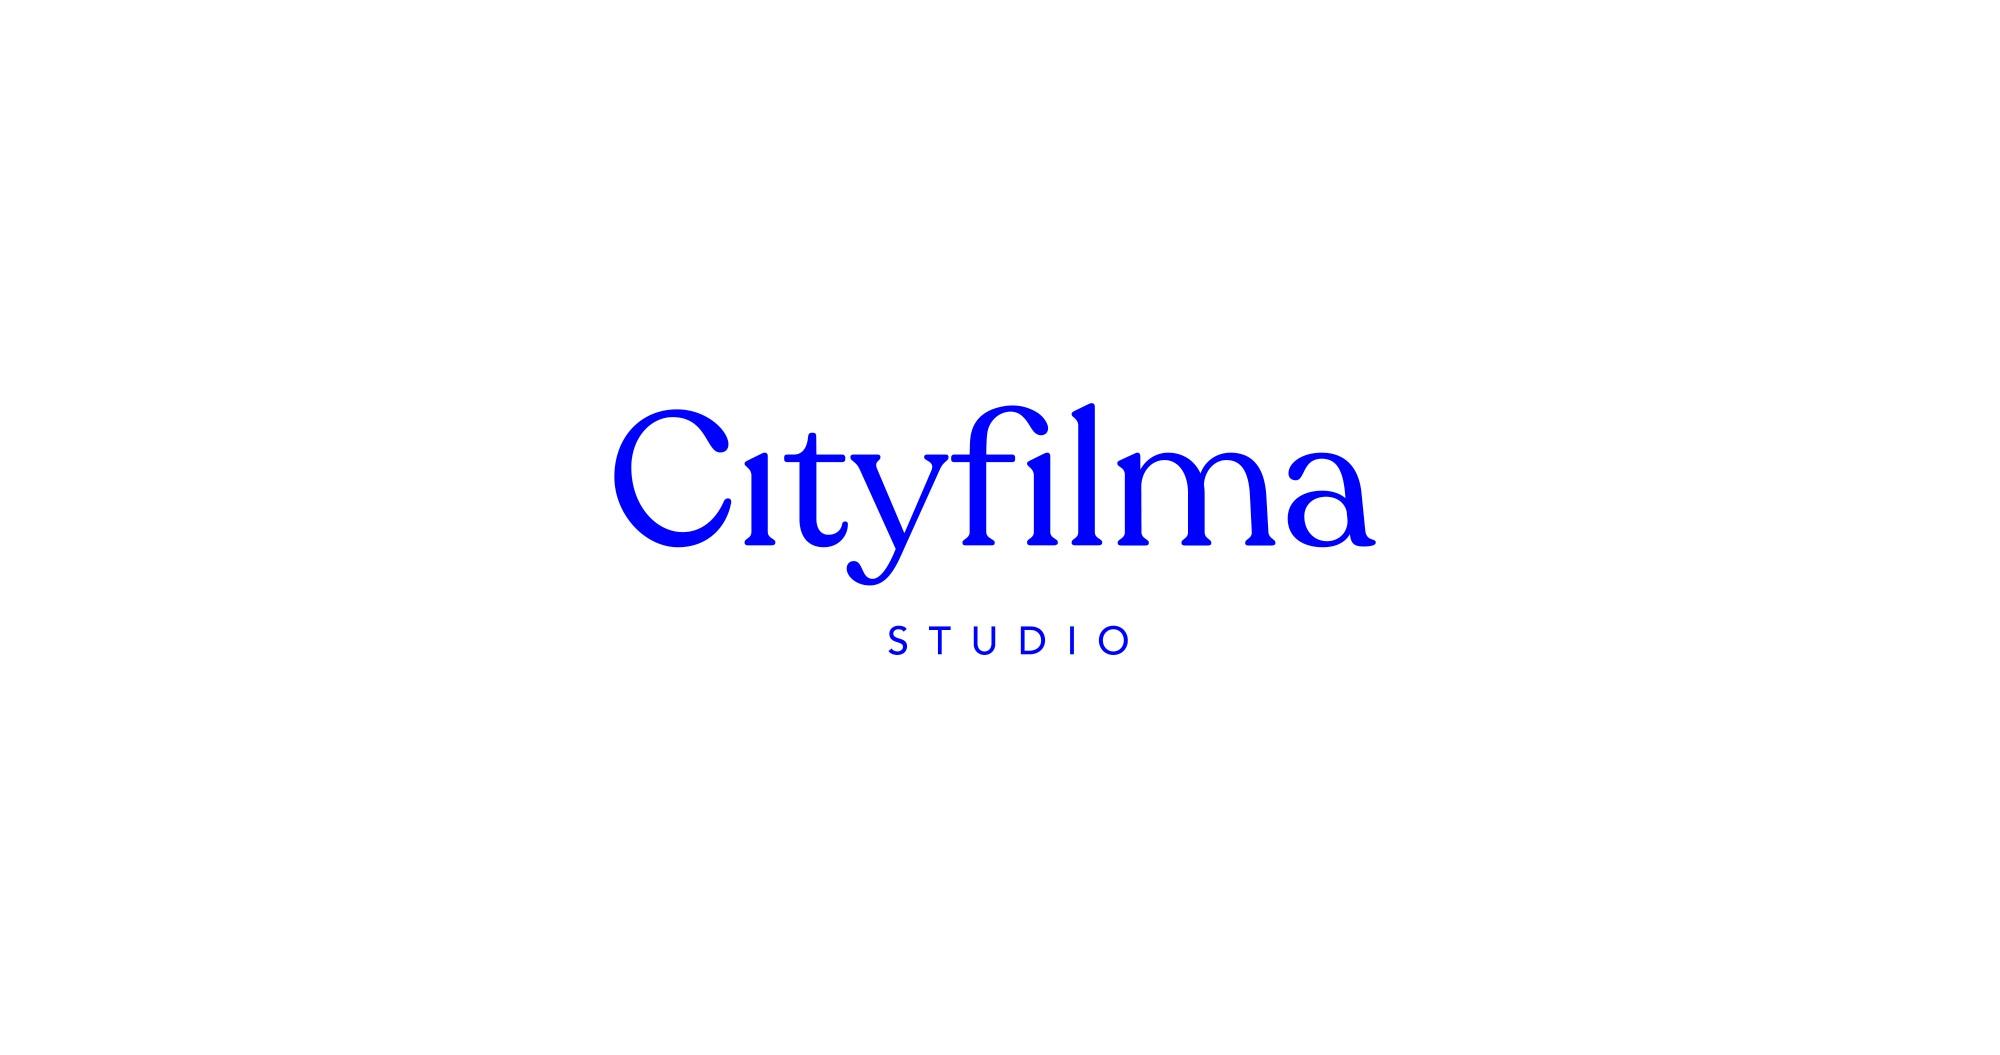 cityfilma_estelalcaraz_02